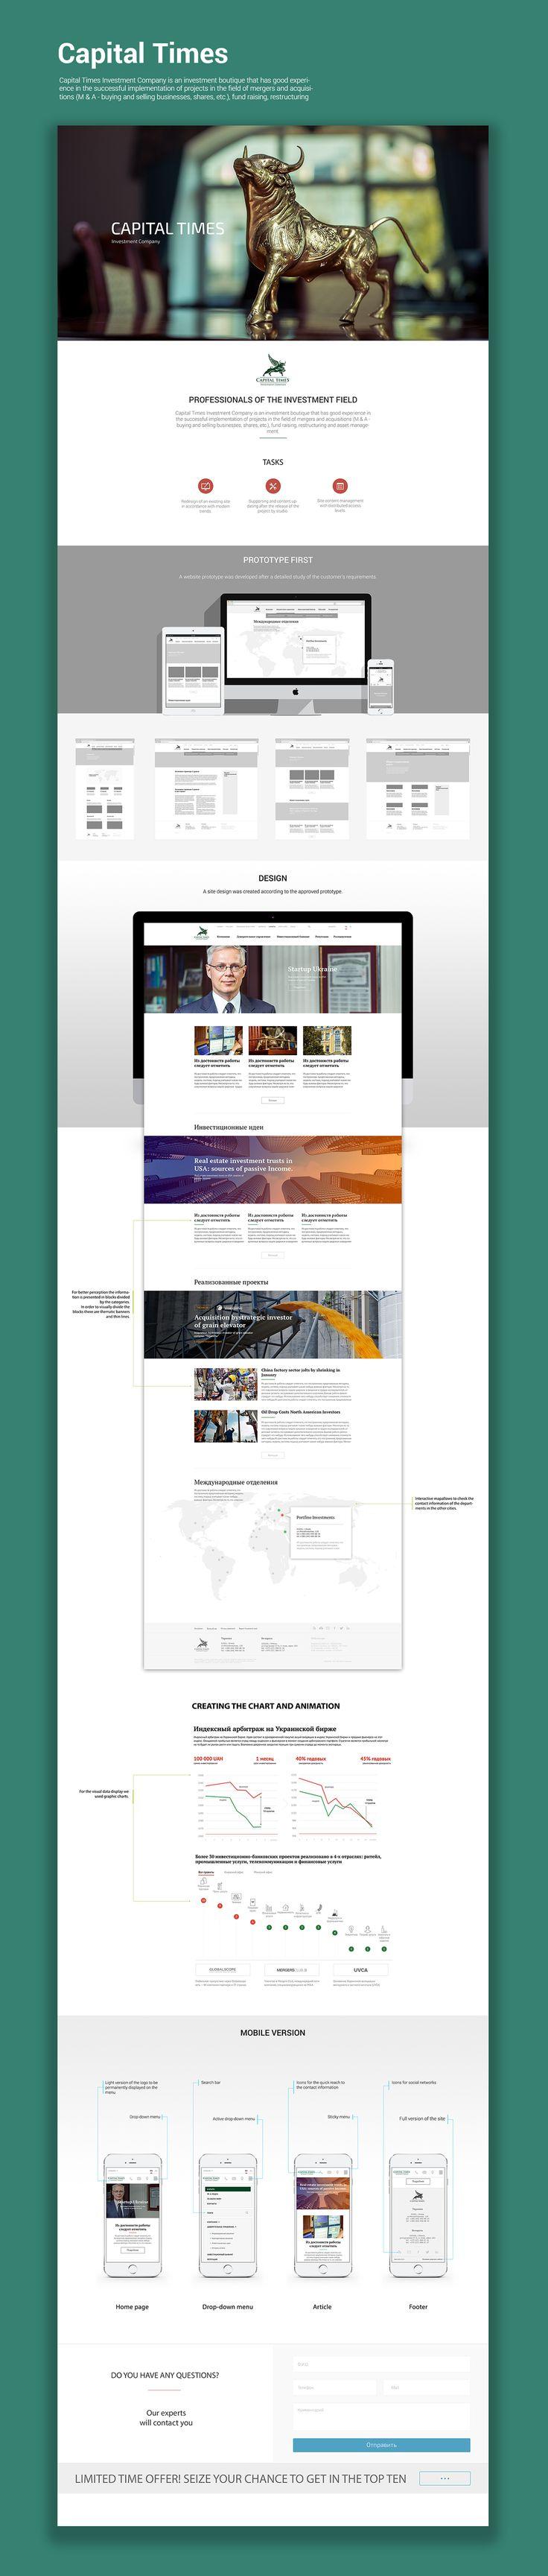 Capital Times Website on Behance